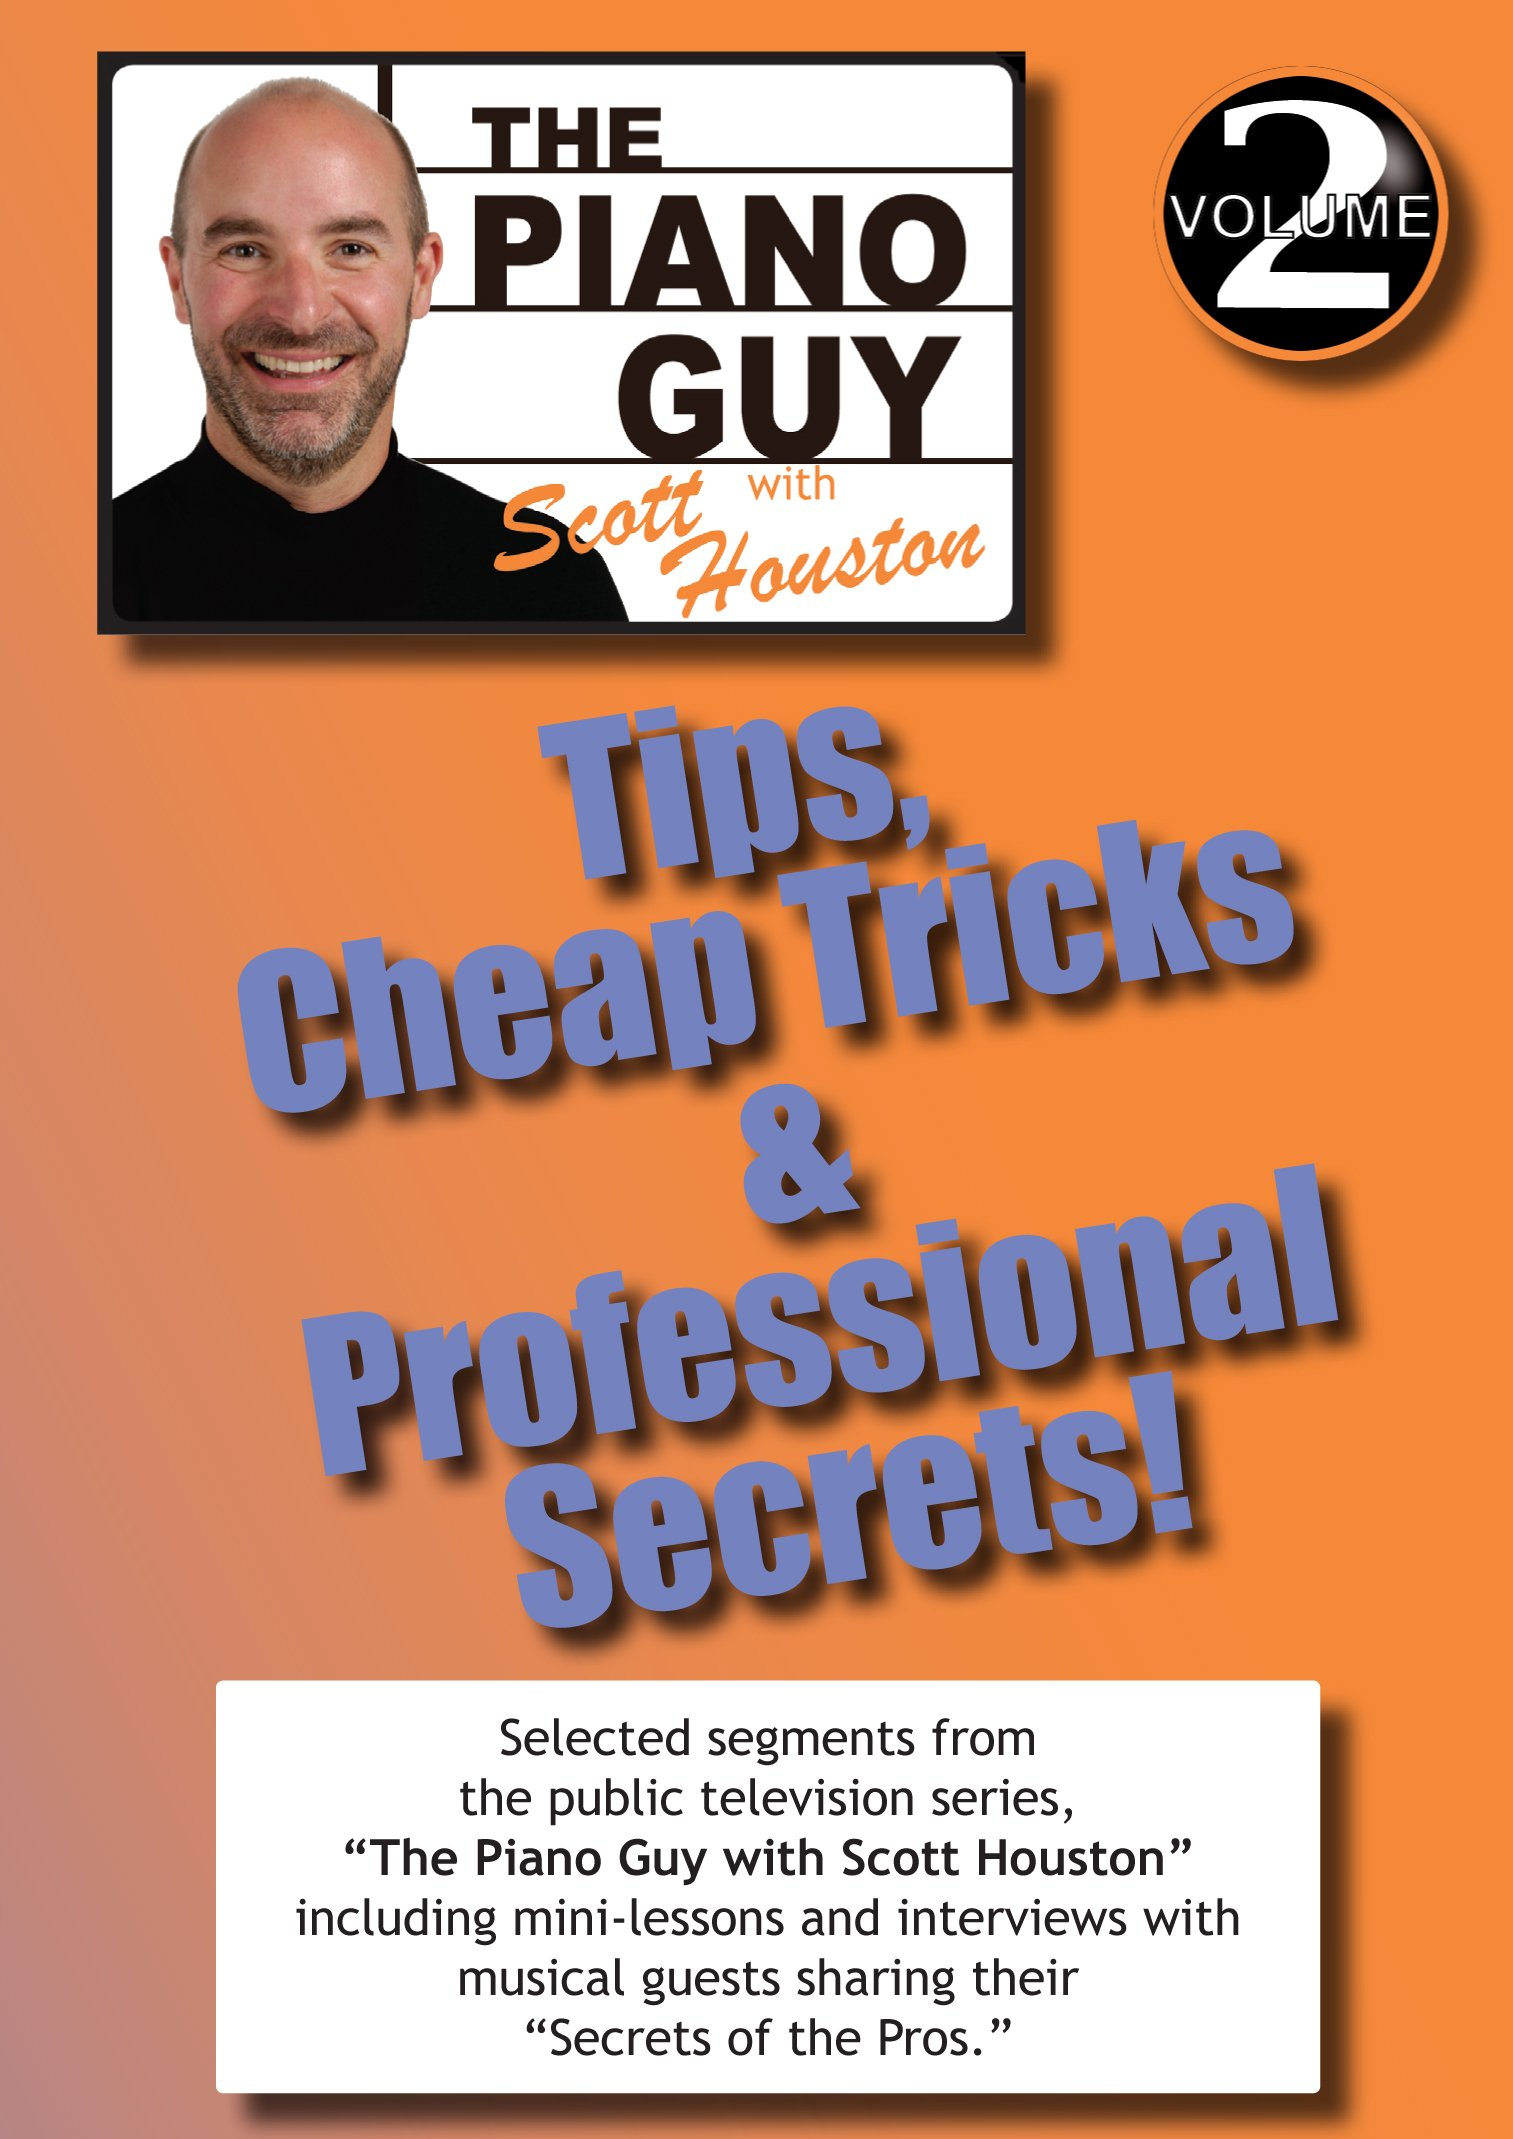 The Piano Guy, Vol. 2 Tips: Cheap Tricks & Professional Secrets!